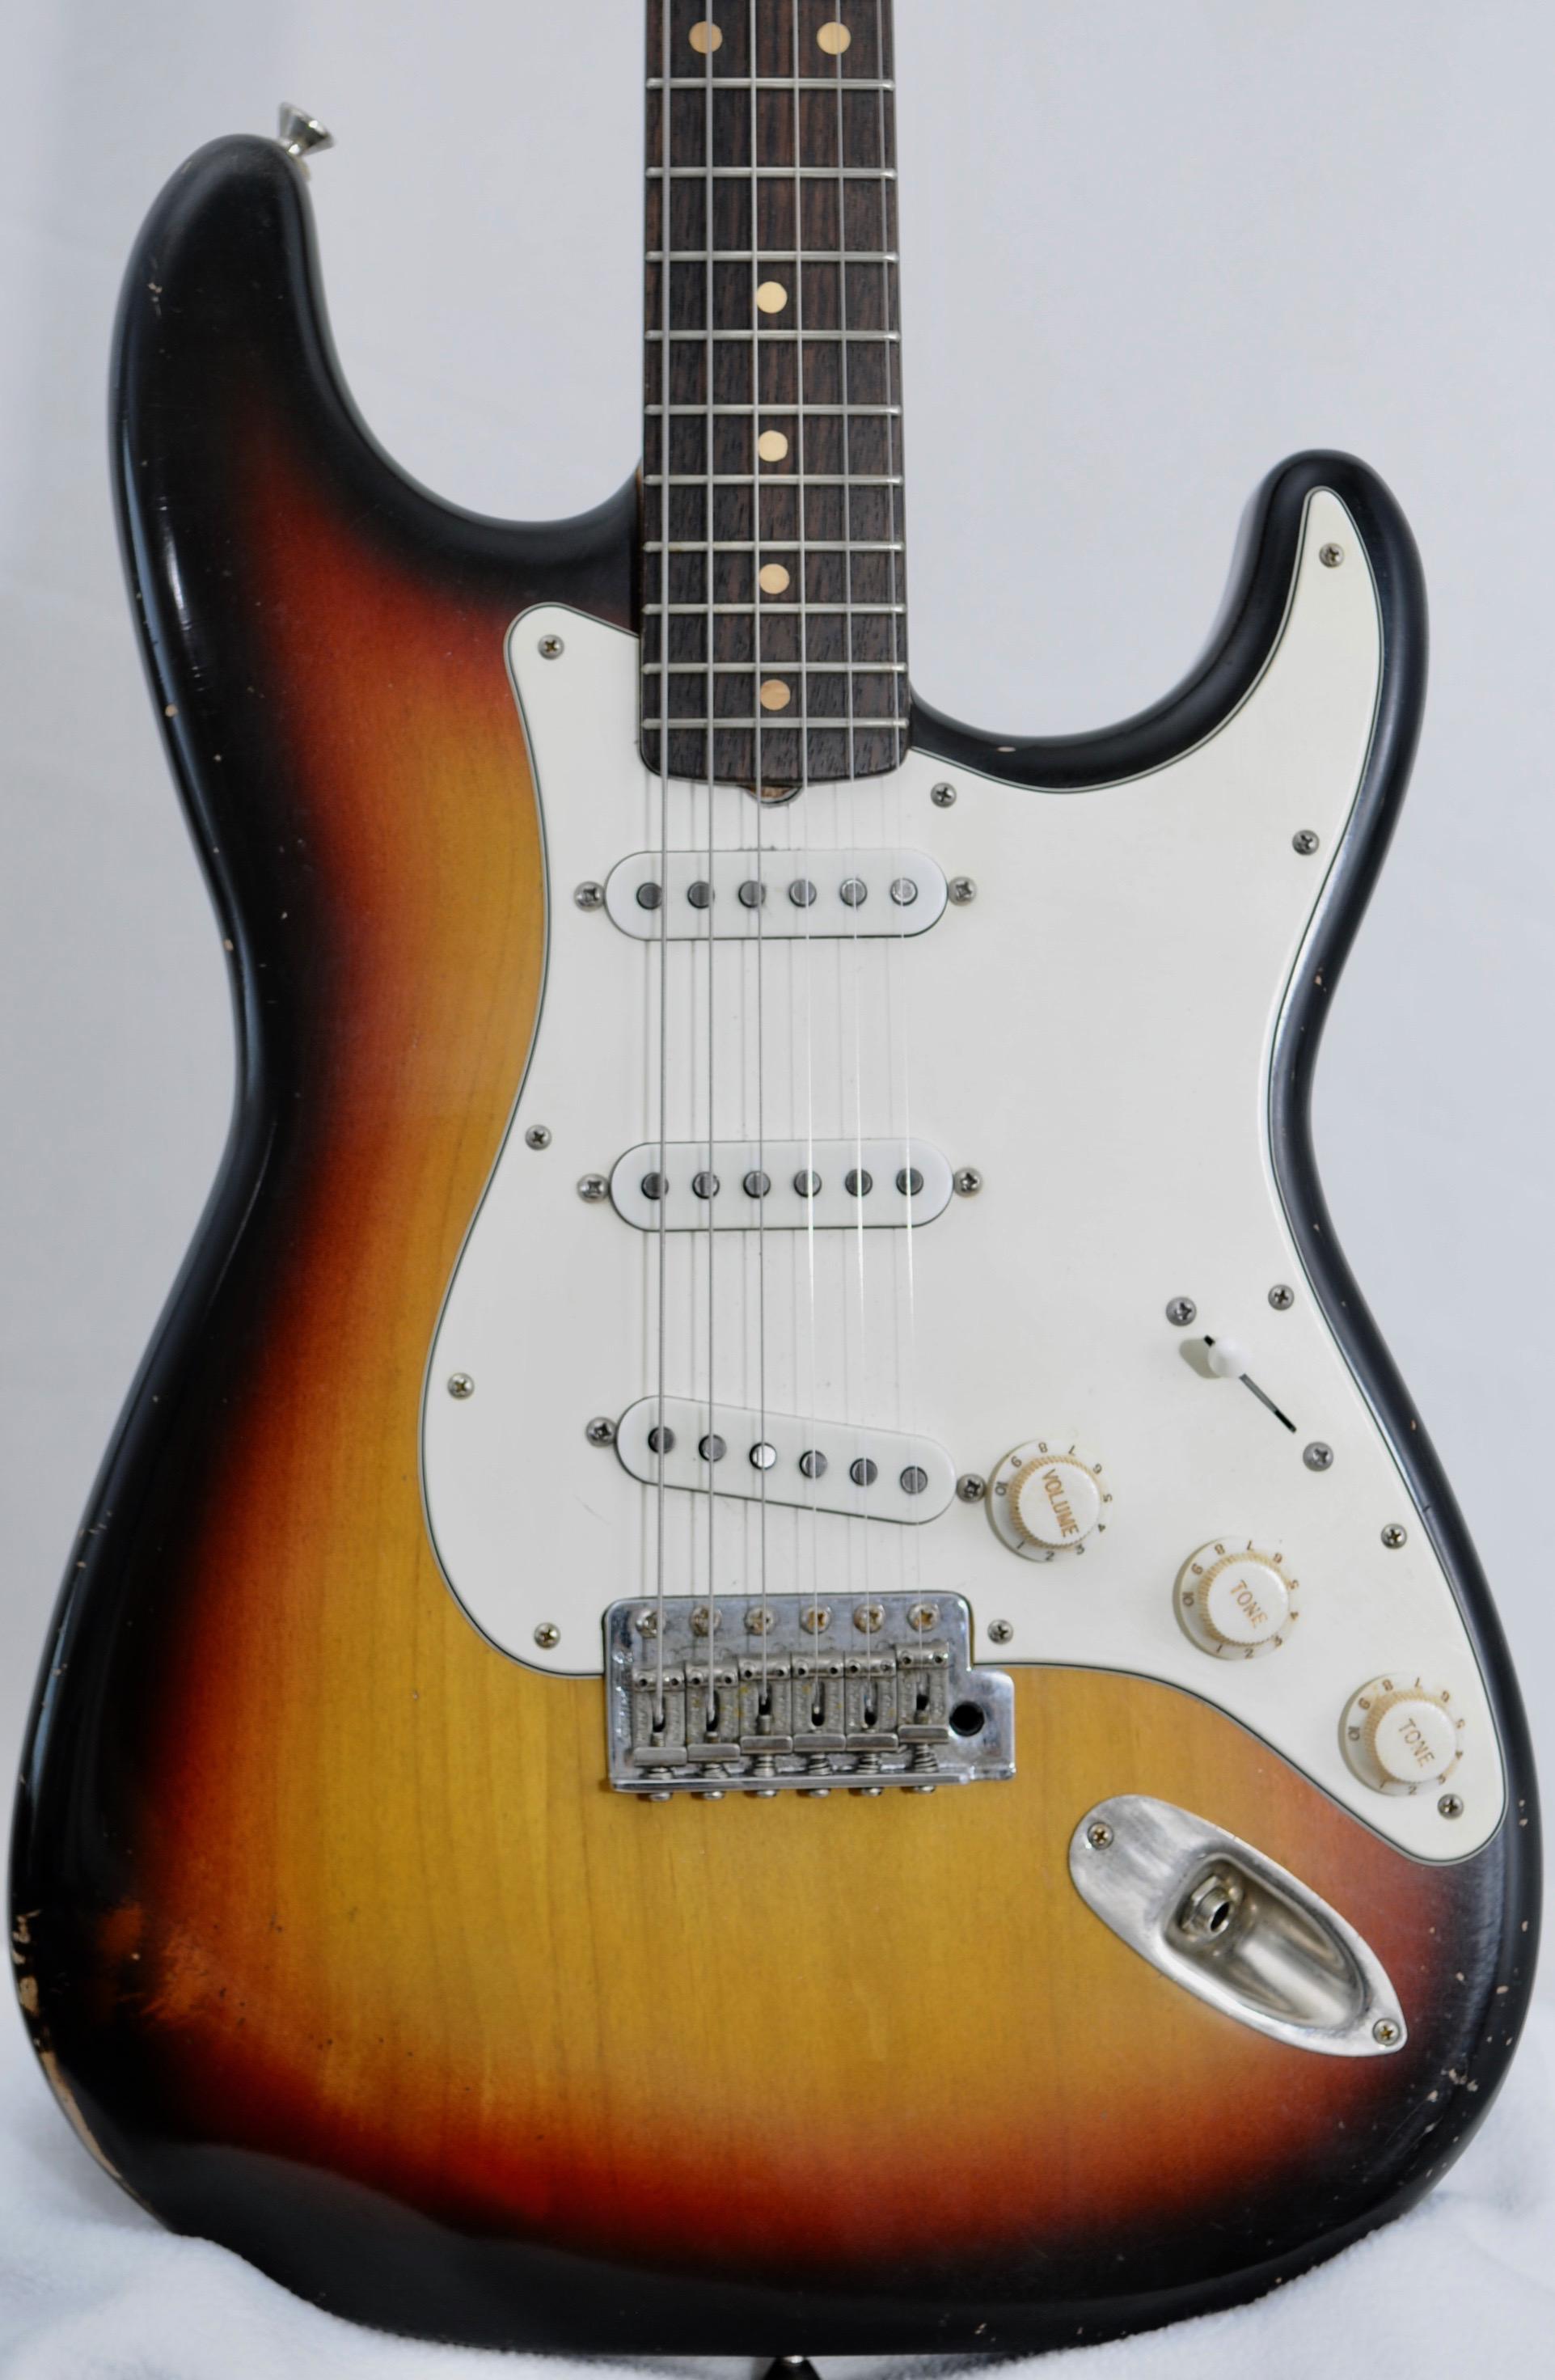 Mario Martin Stratocaster – WOW Neck – Cert/Build Sheet/Case Included